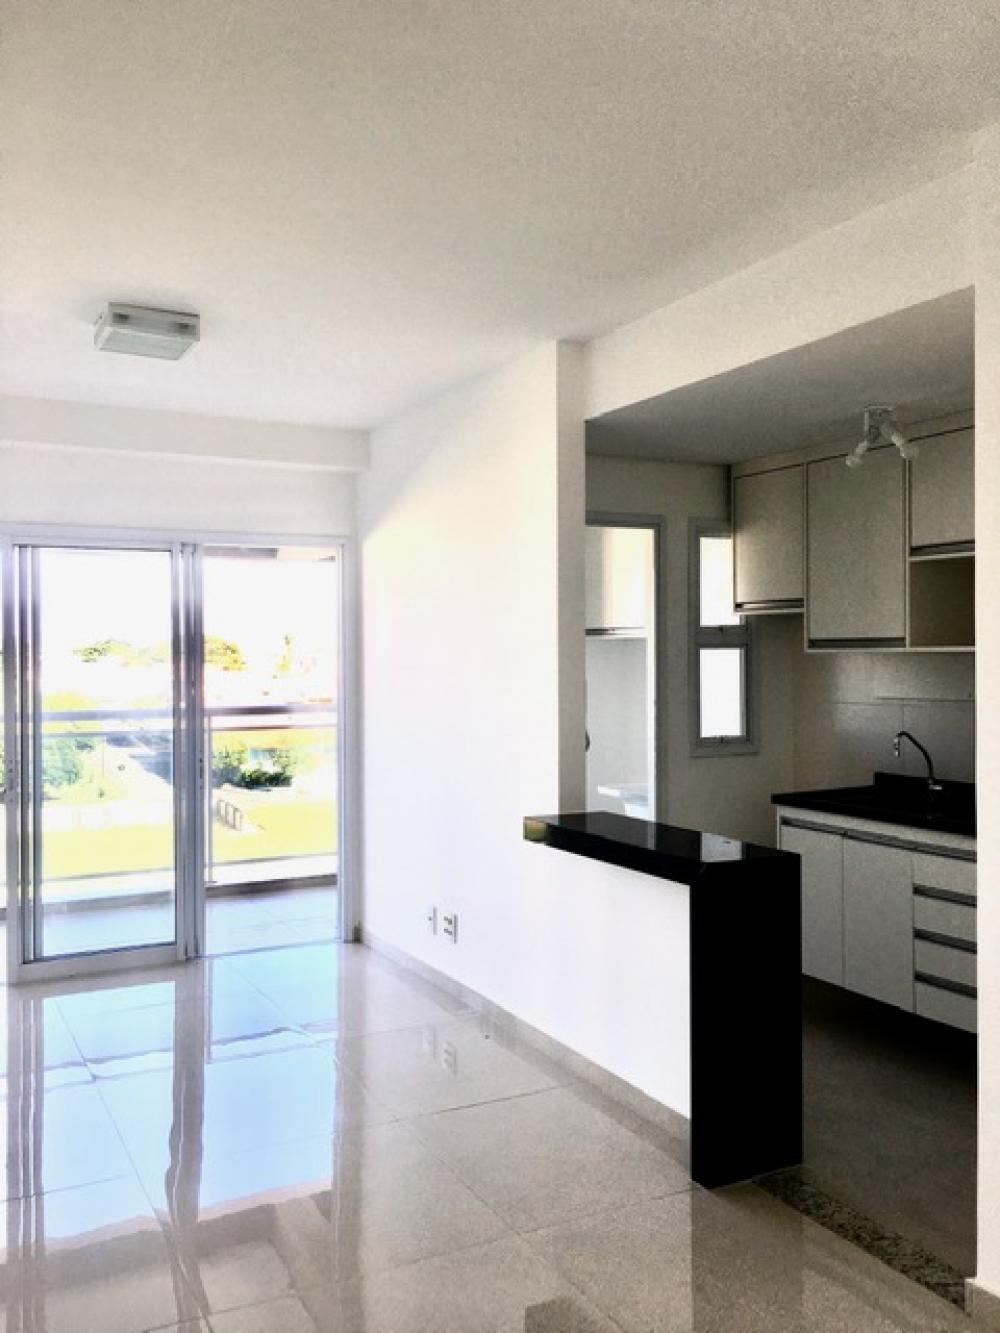 Sao Jose do Rio Preto Apartamento Locacao R$ 2.200,00 Condominio R$546,00 2 Dormitorios 2 Vagas Area construida 91.00m2